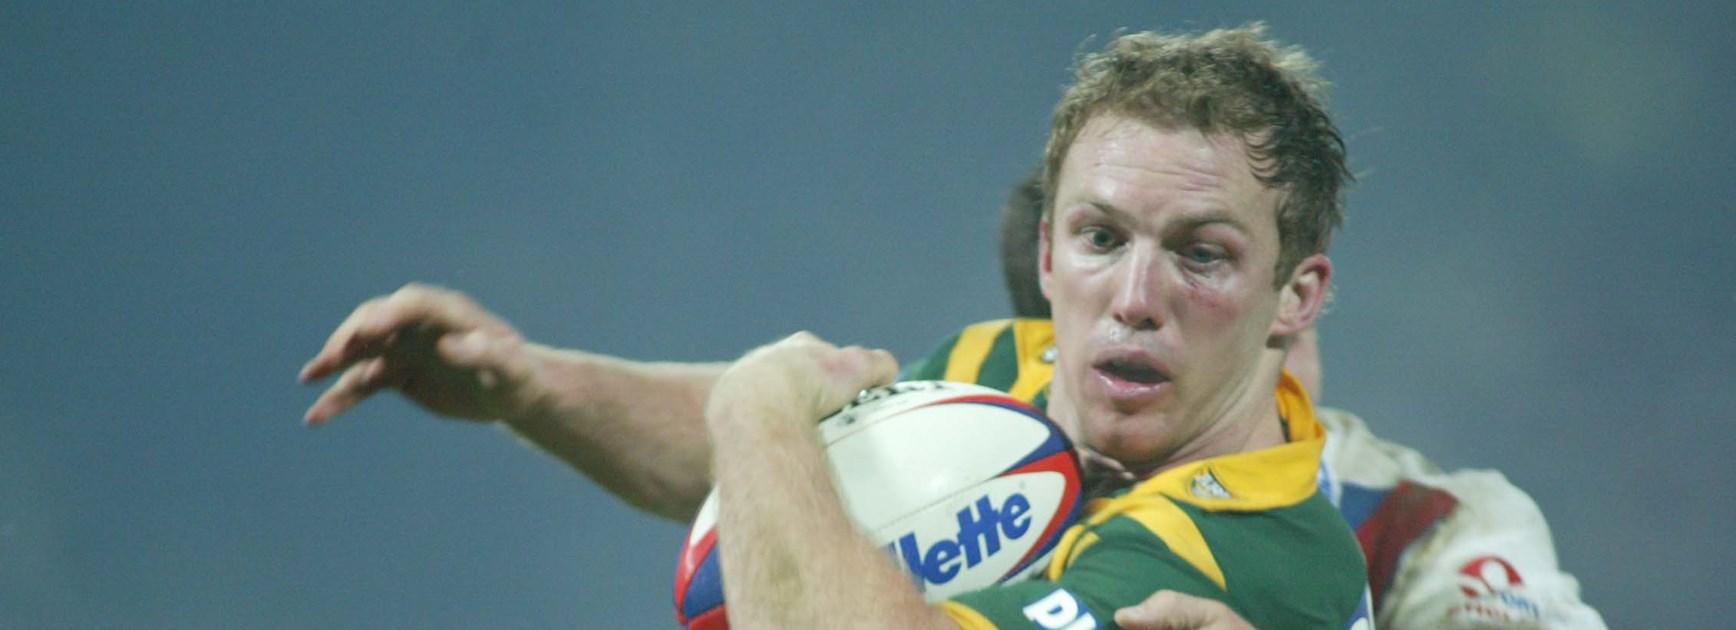 Darren Lockyer playing for Australia in 2003.